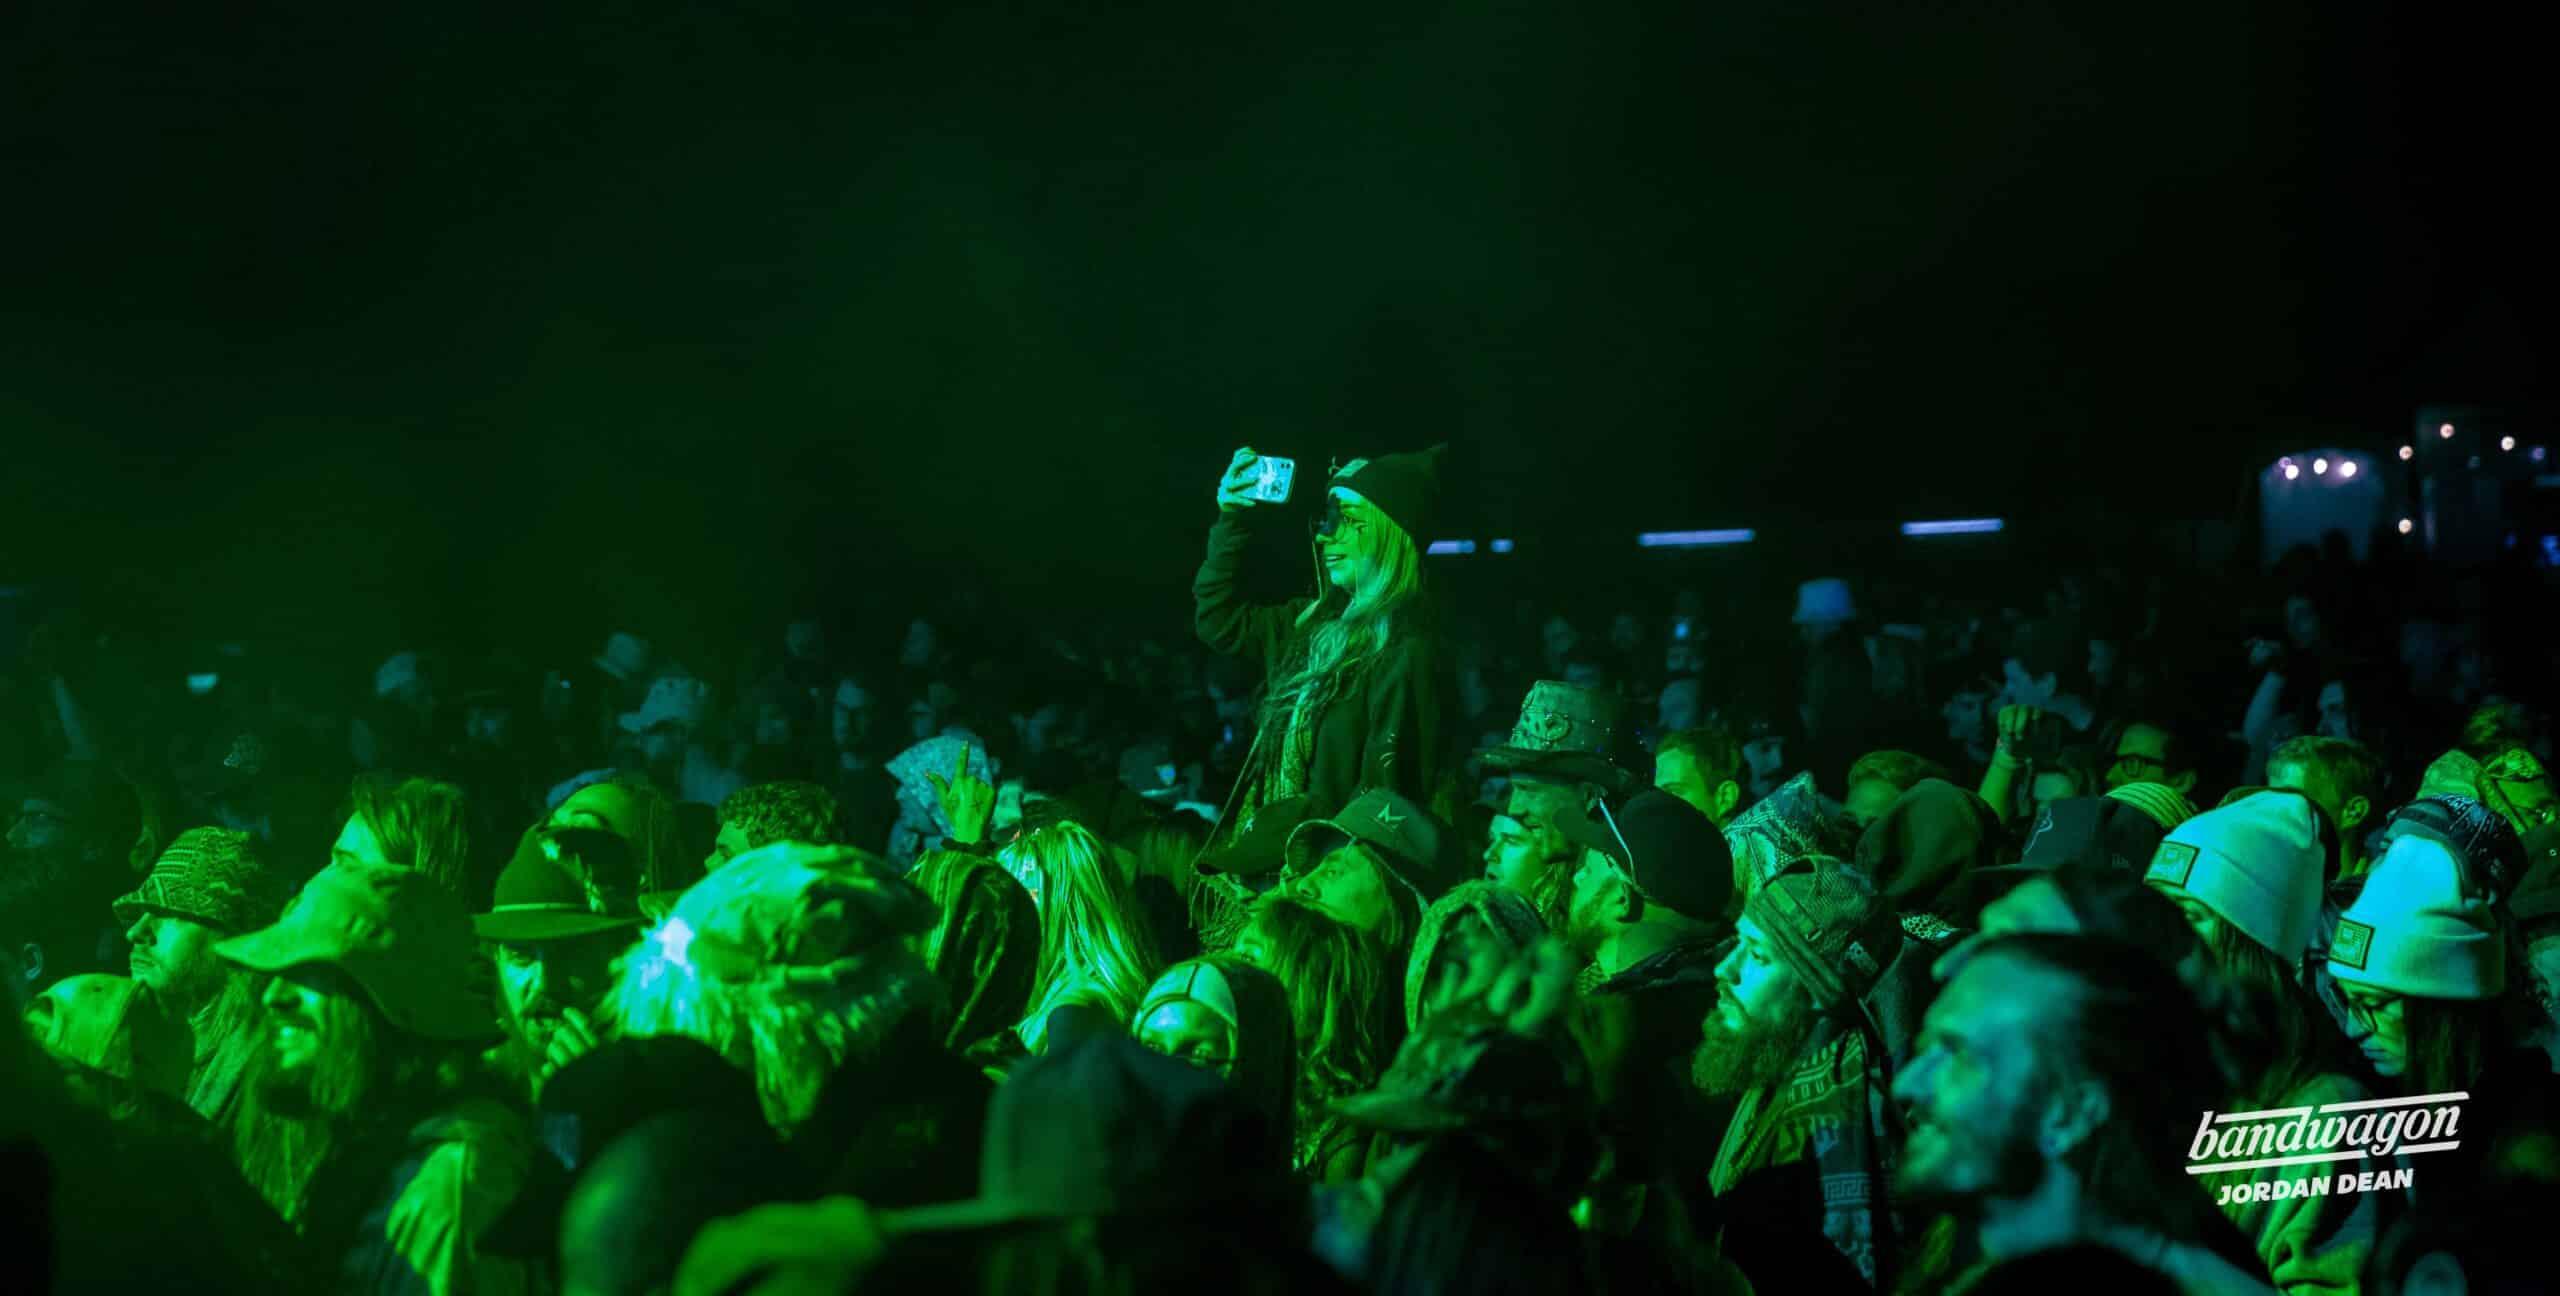 CharlestheFirst at The Chinook - photo by Jordan Dean